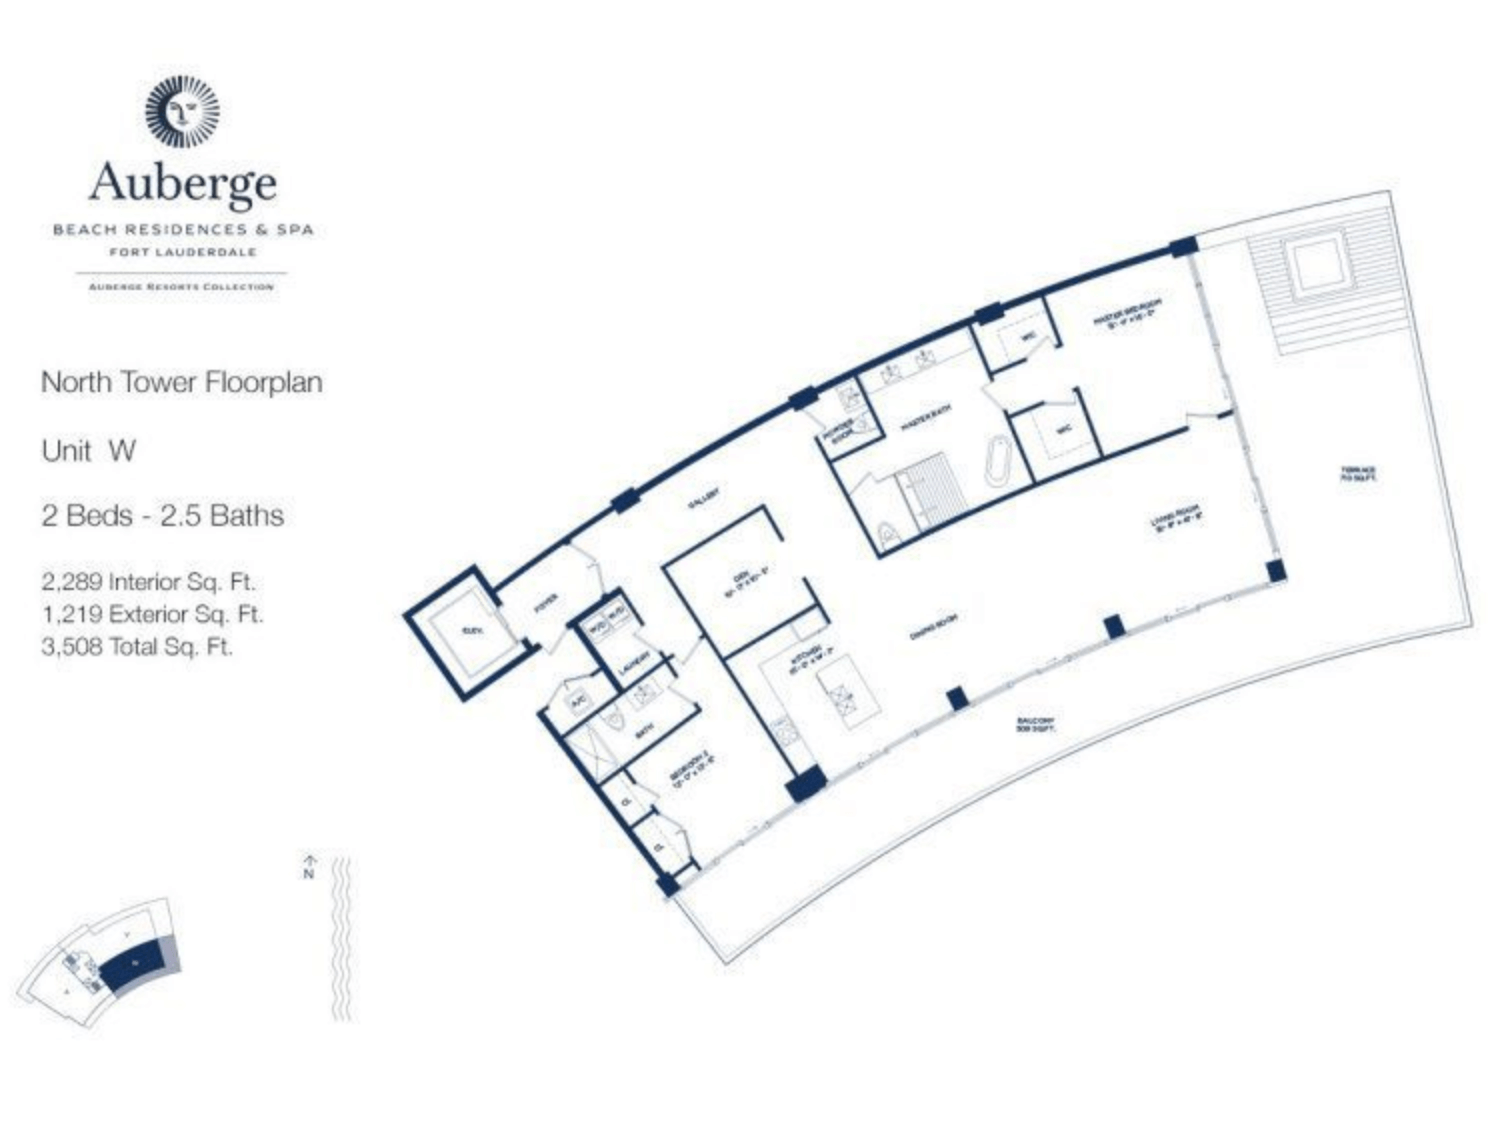 Auberge Beach Residences North Tower W | 2 Beds - 2.5 baths